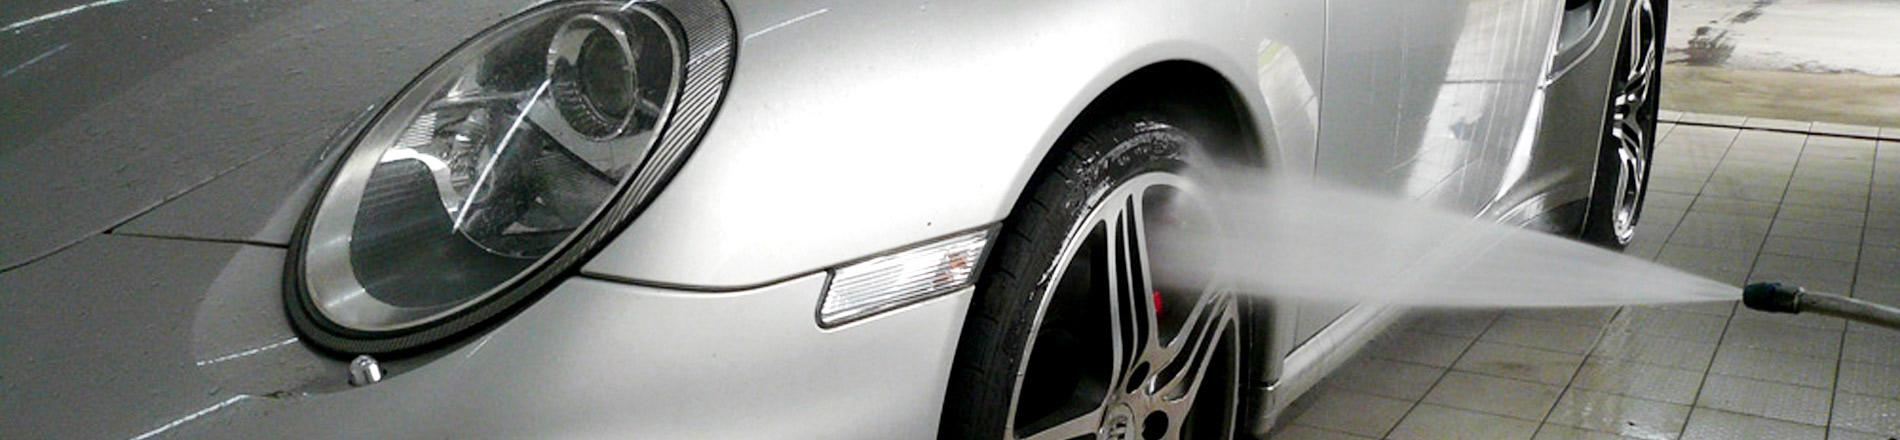 Glanz Fahrzeugaufbereitung Bergkamen | Sportwagen, Limousinen